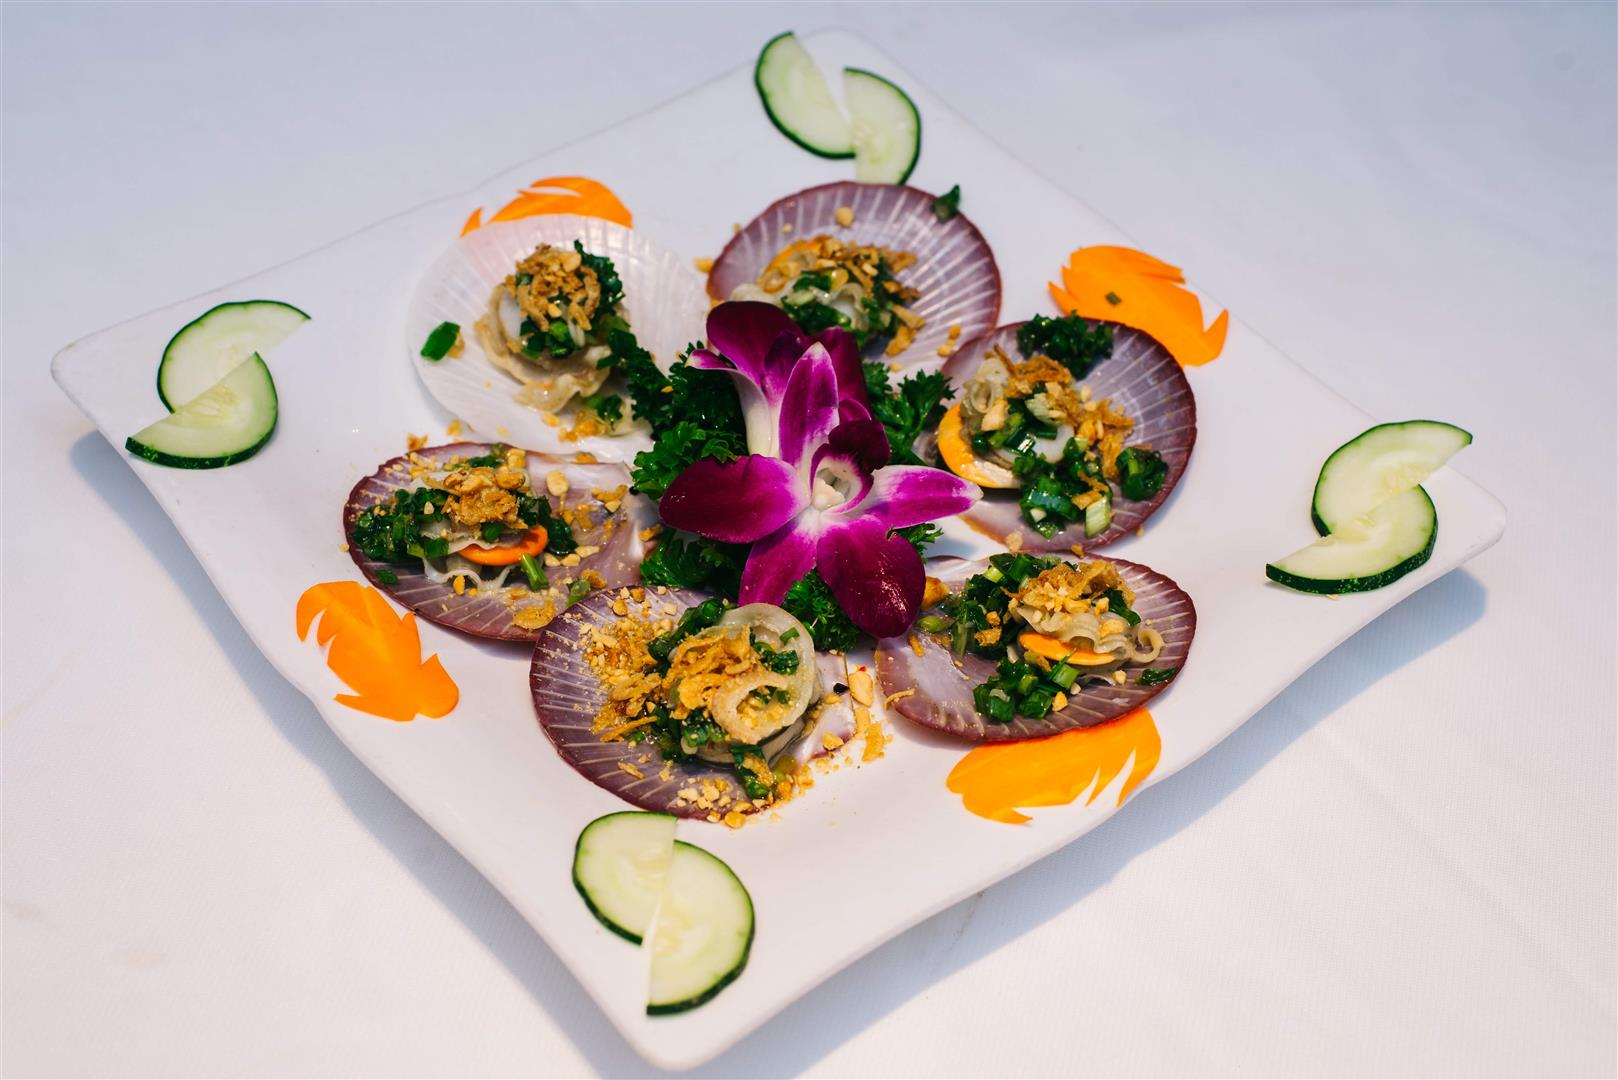 Sò Điệp Nướng Mỡ Hành / Scallop Grilled with onion and oil